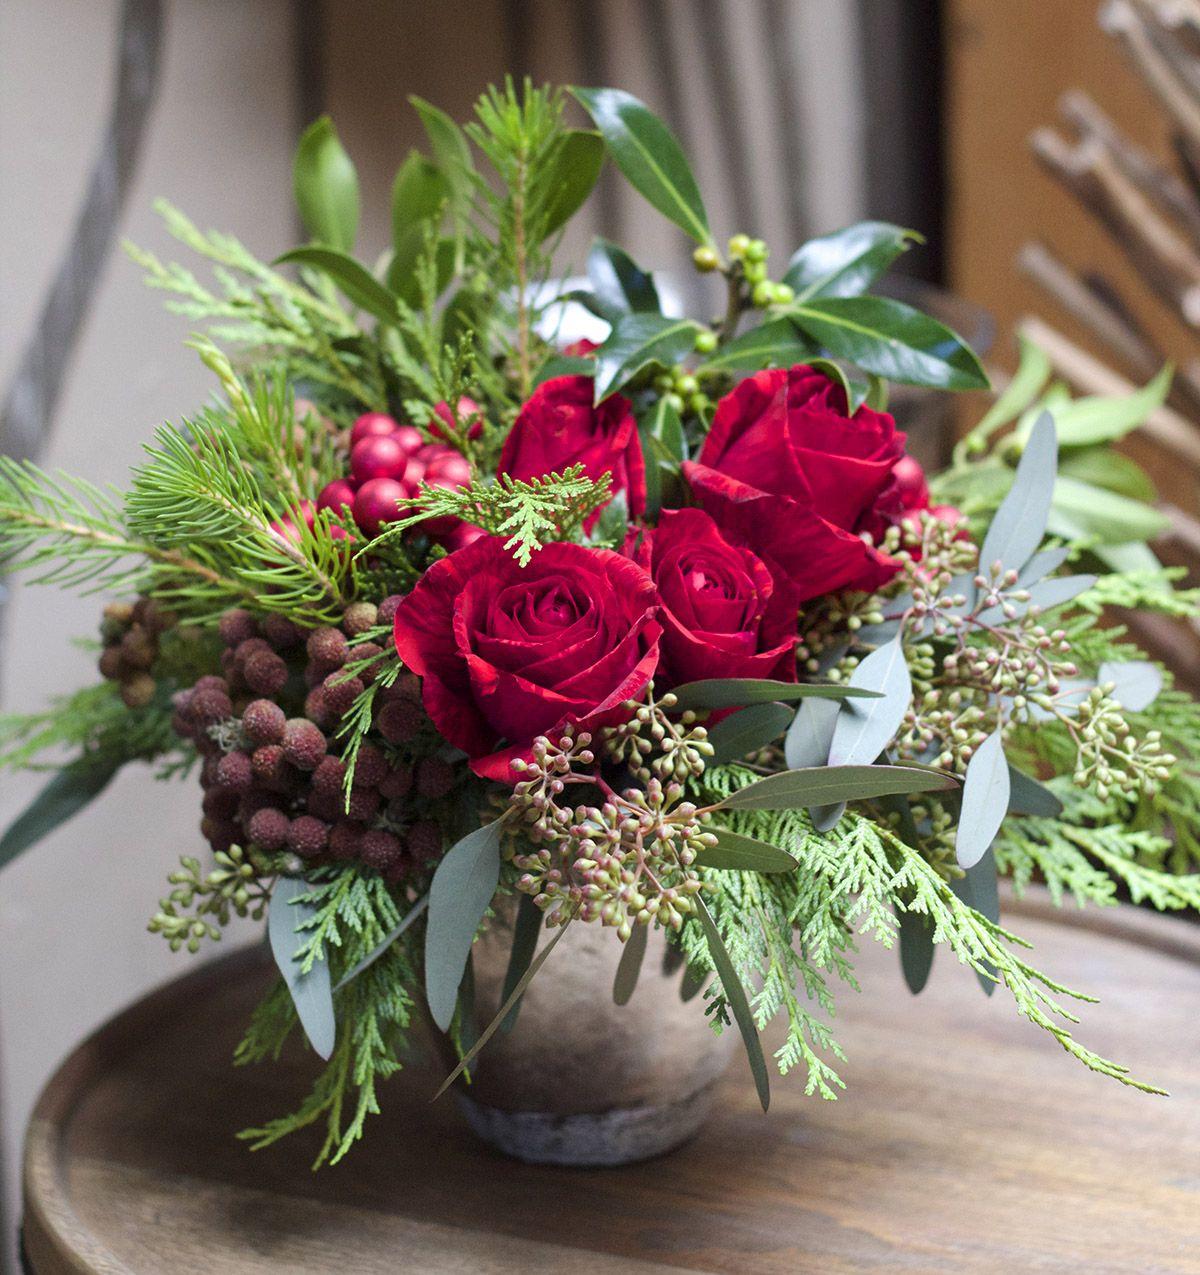 Floral Studio In OC Christmas floral arrangements